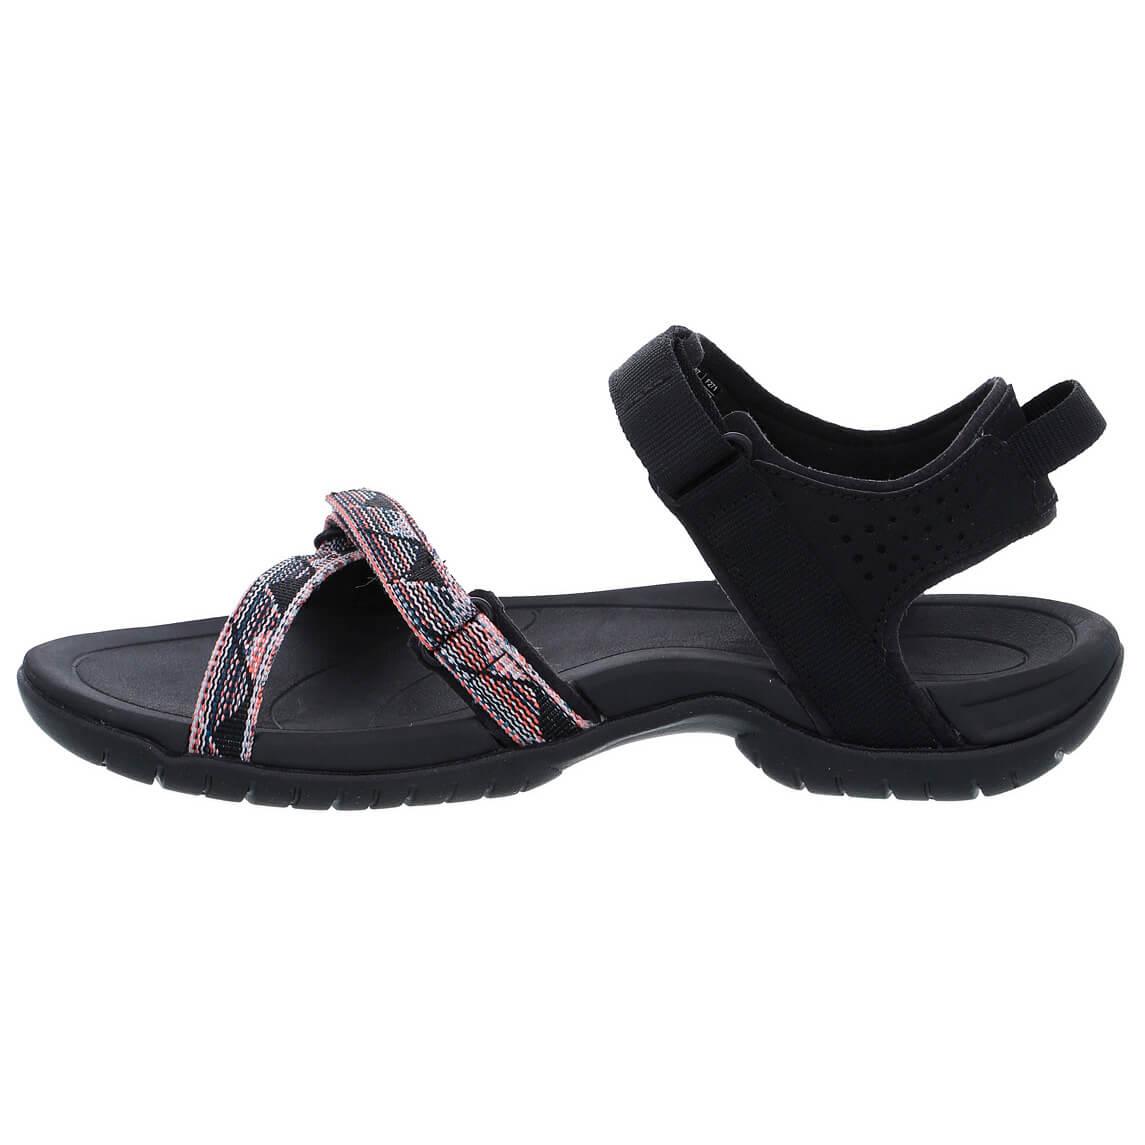 3c9facdab986 ... Teva - Women s Verra - Sandals ...